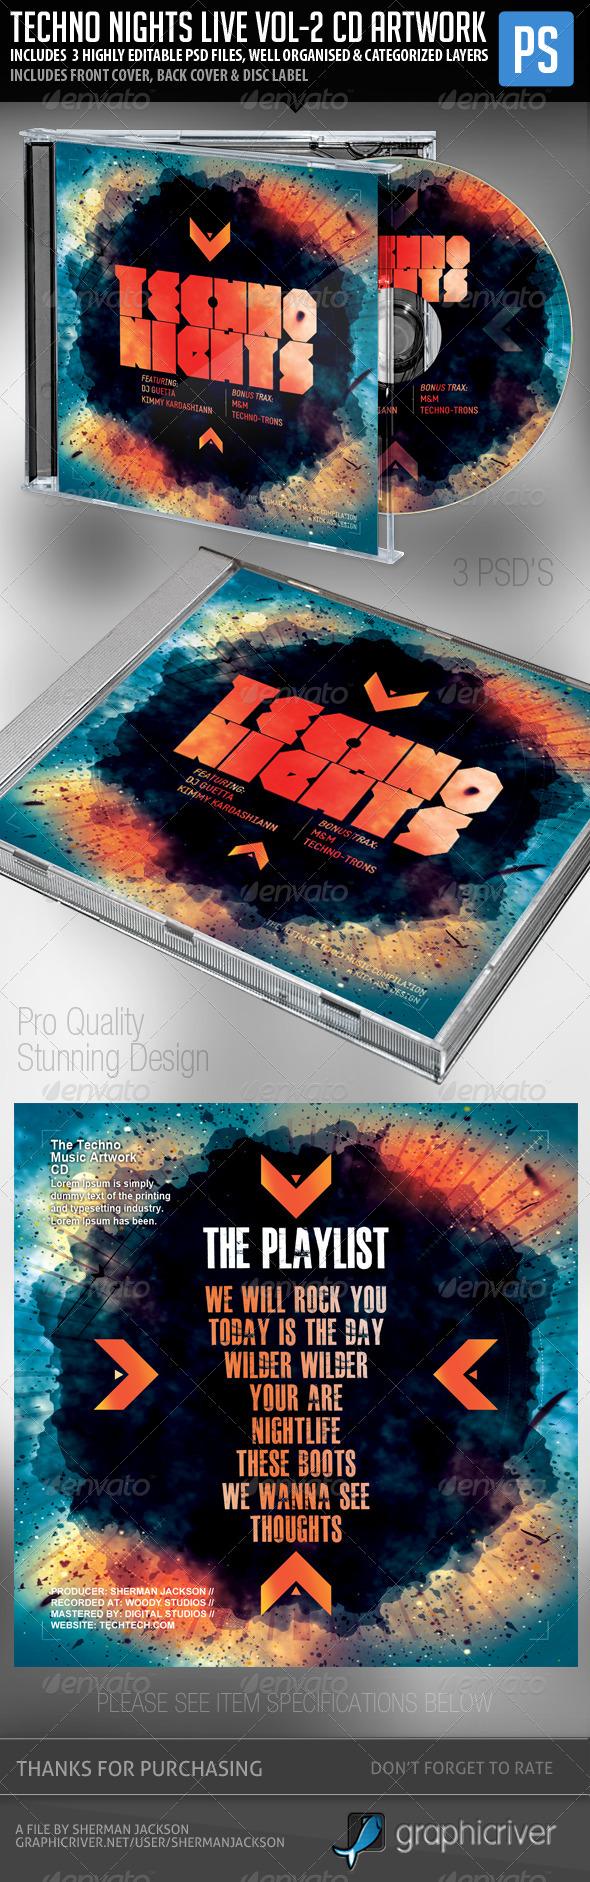 Techno Nights Live Vol.2 CD Album Artwork - CD & DVD Artwork Print Templates